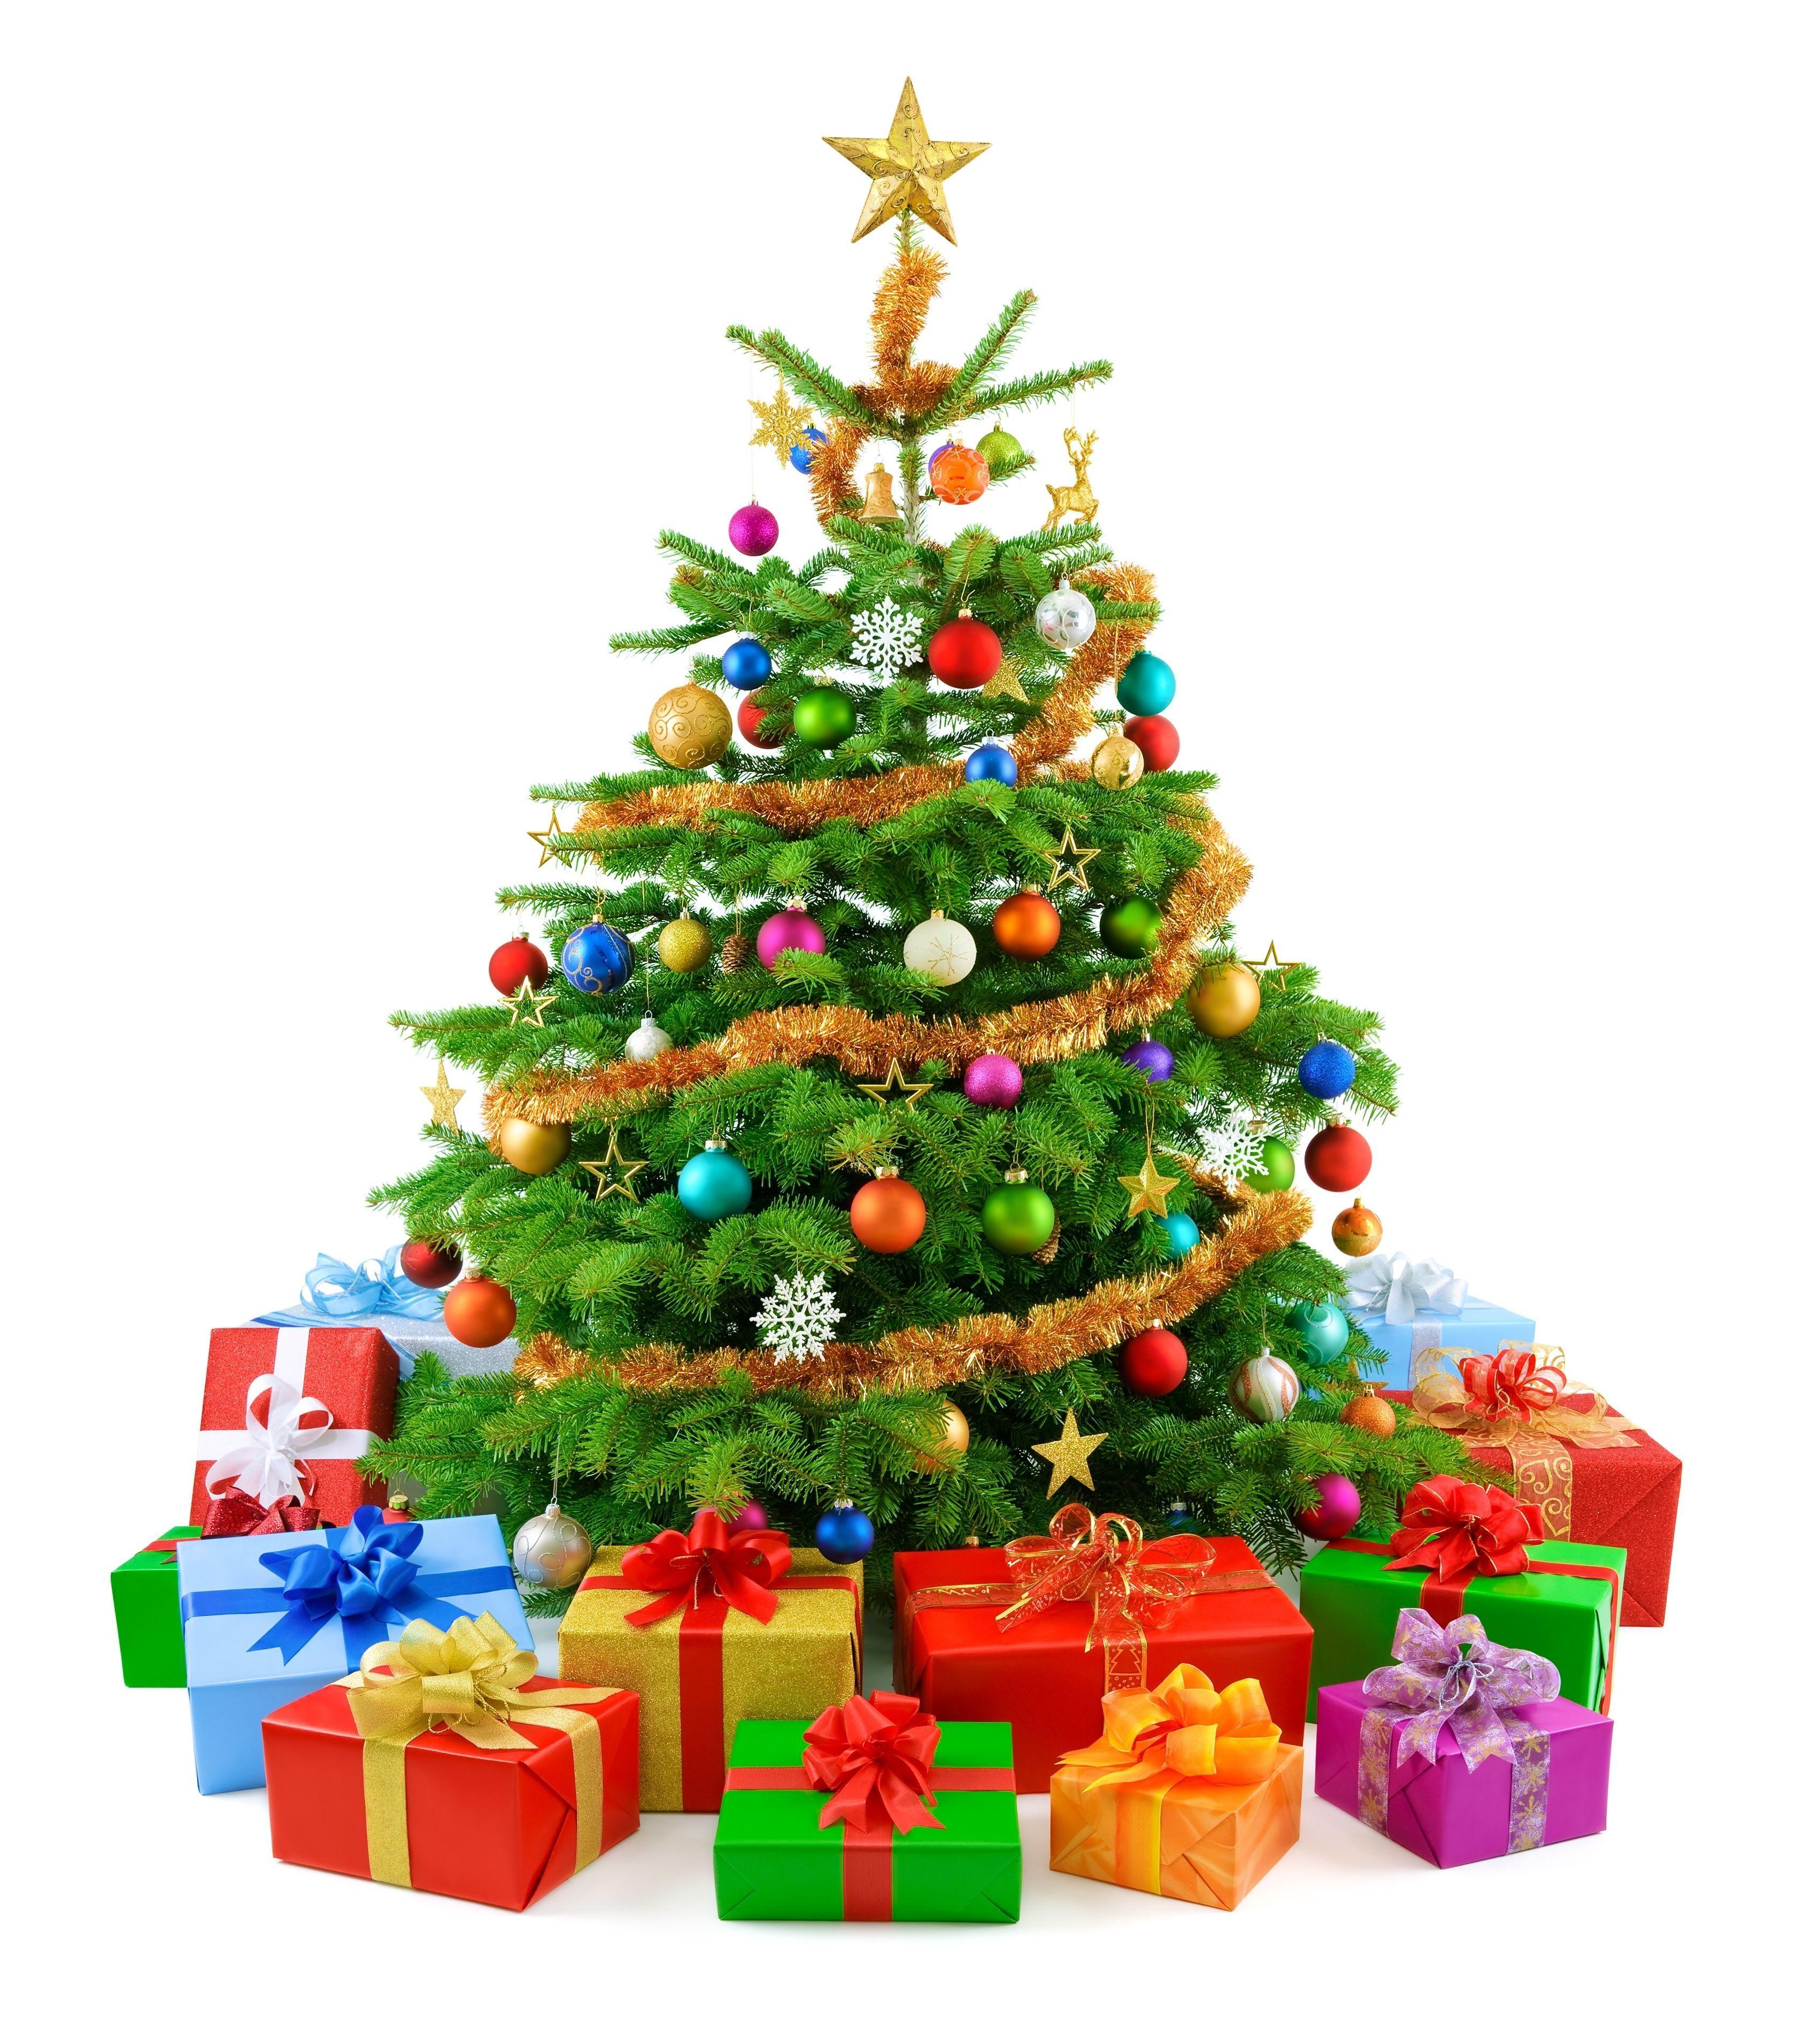 Community Christmas Trees thumbnail image.